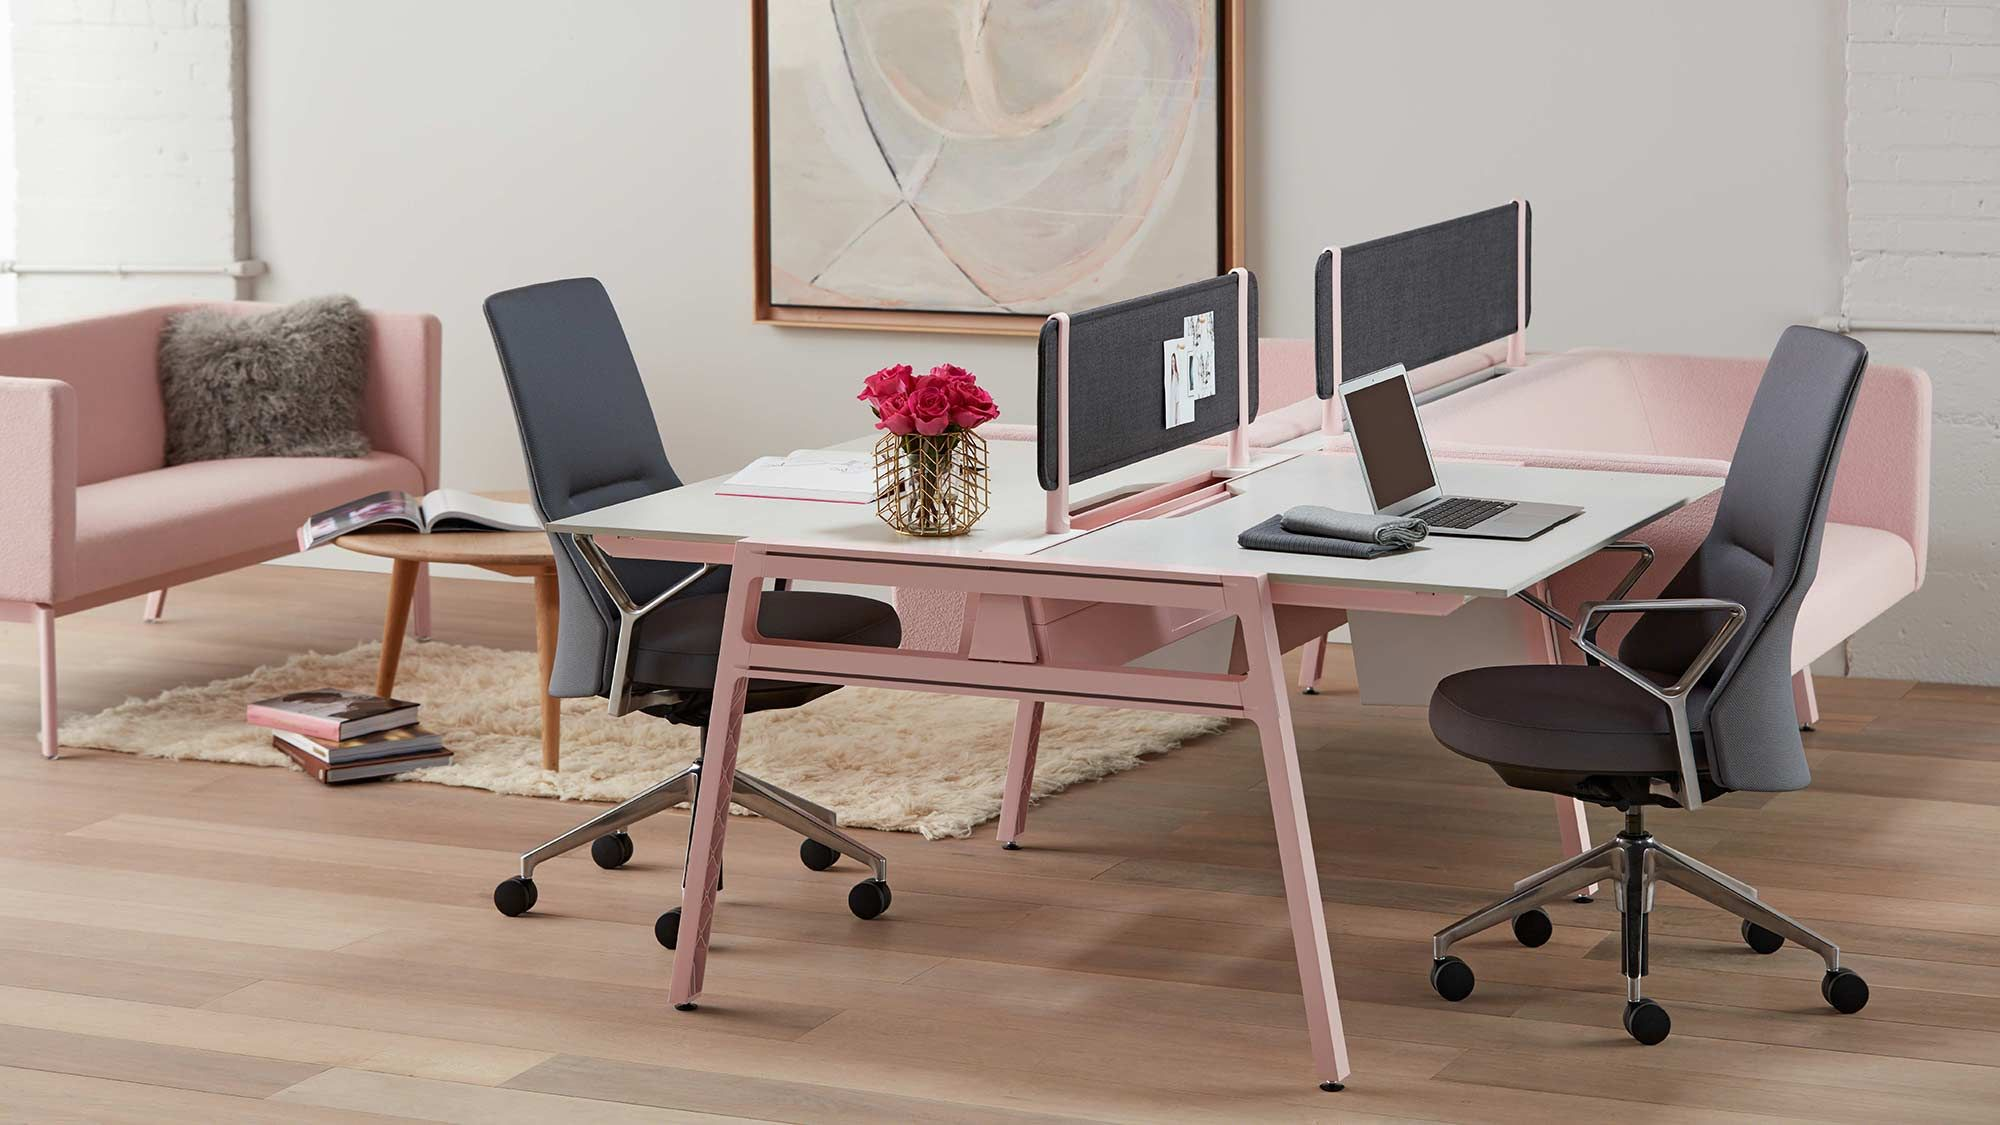 Bivi Collection Of Modular Office Desk Systems Modular Home